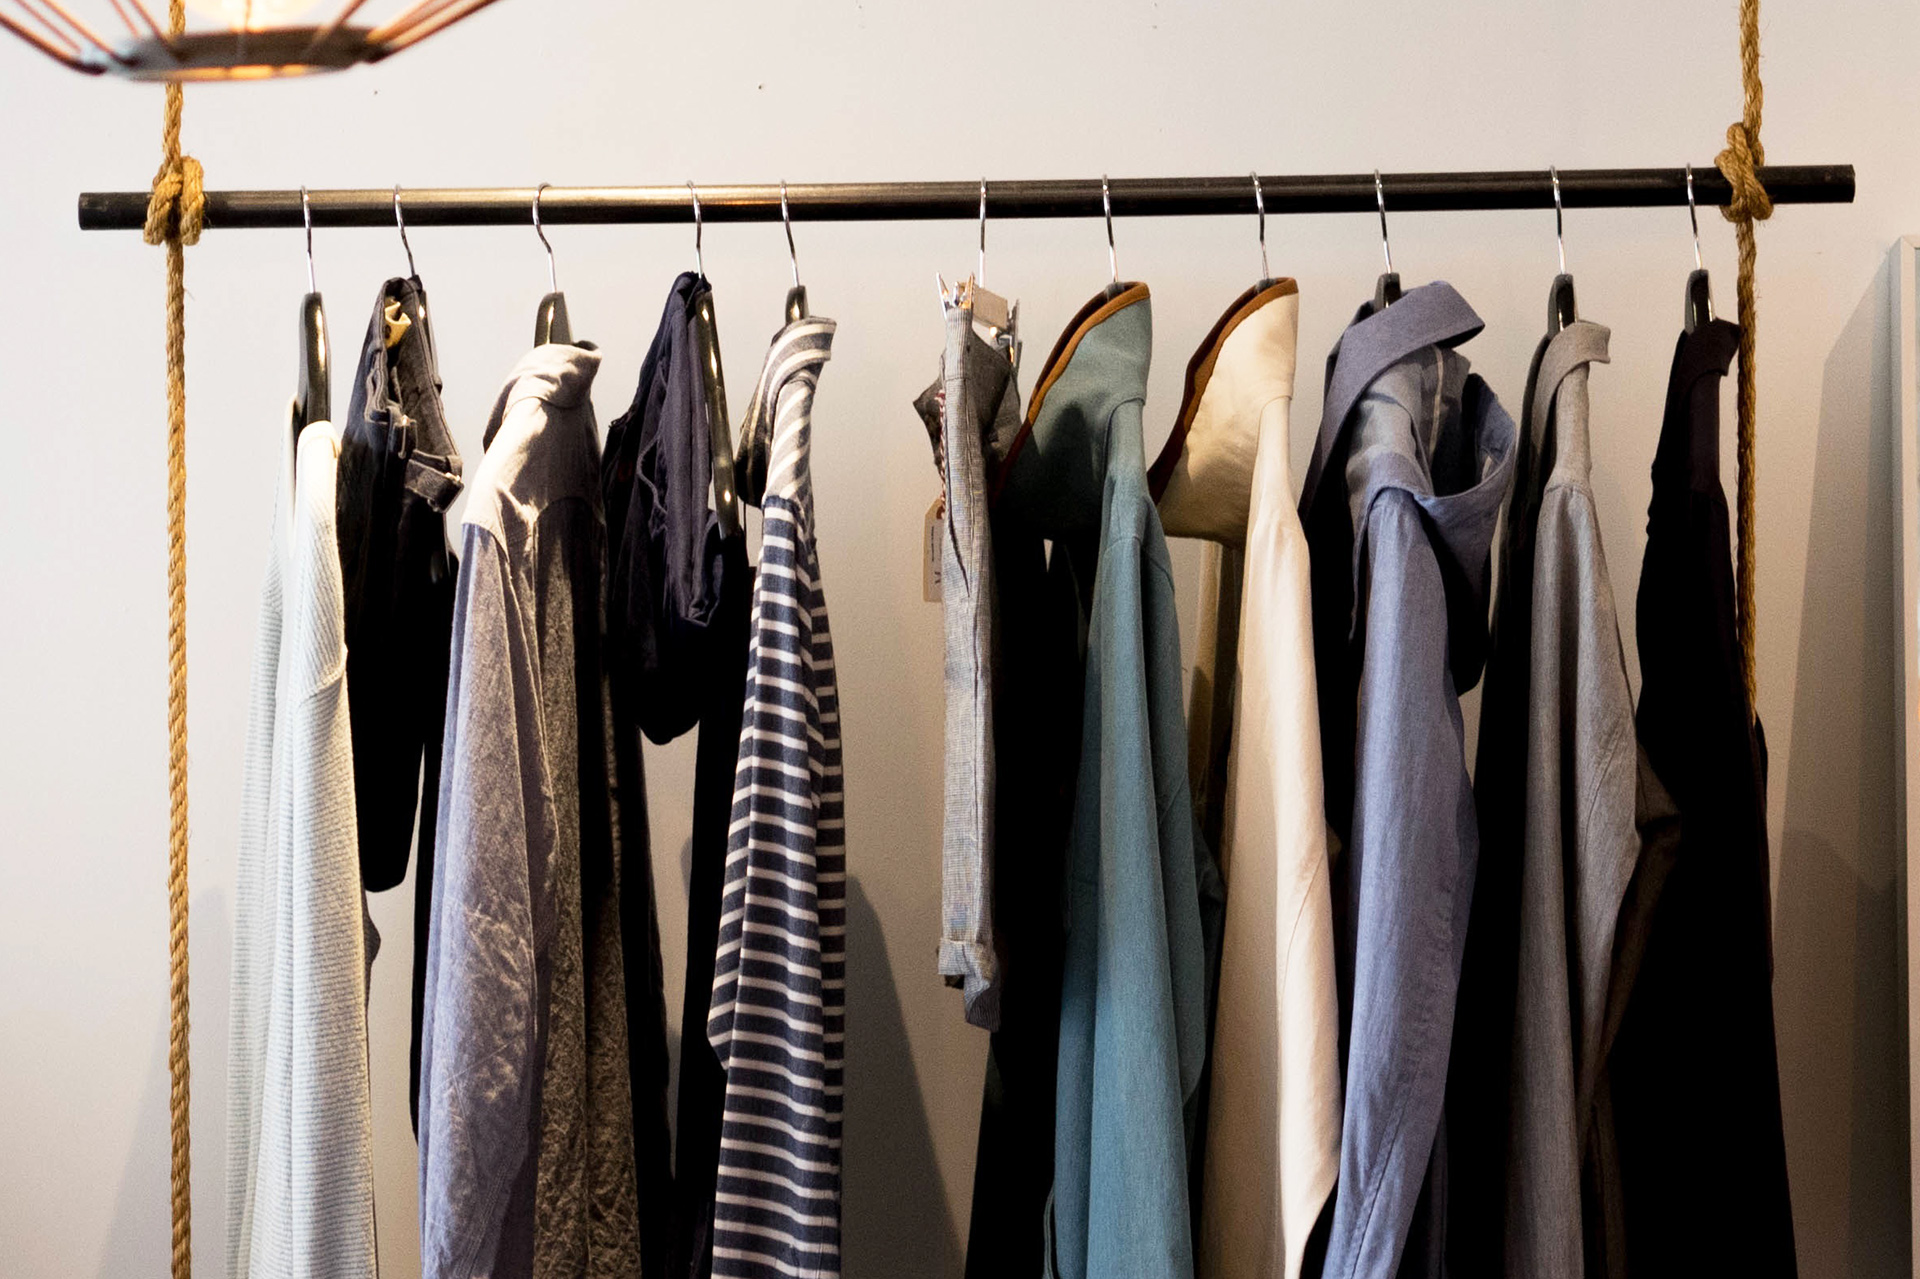 5 Ways to organize your closet - Cheap ideas alert!